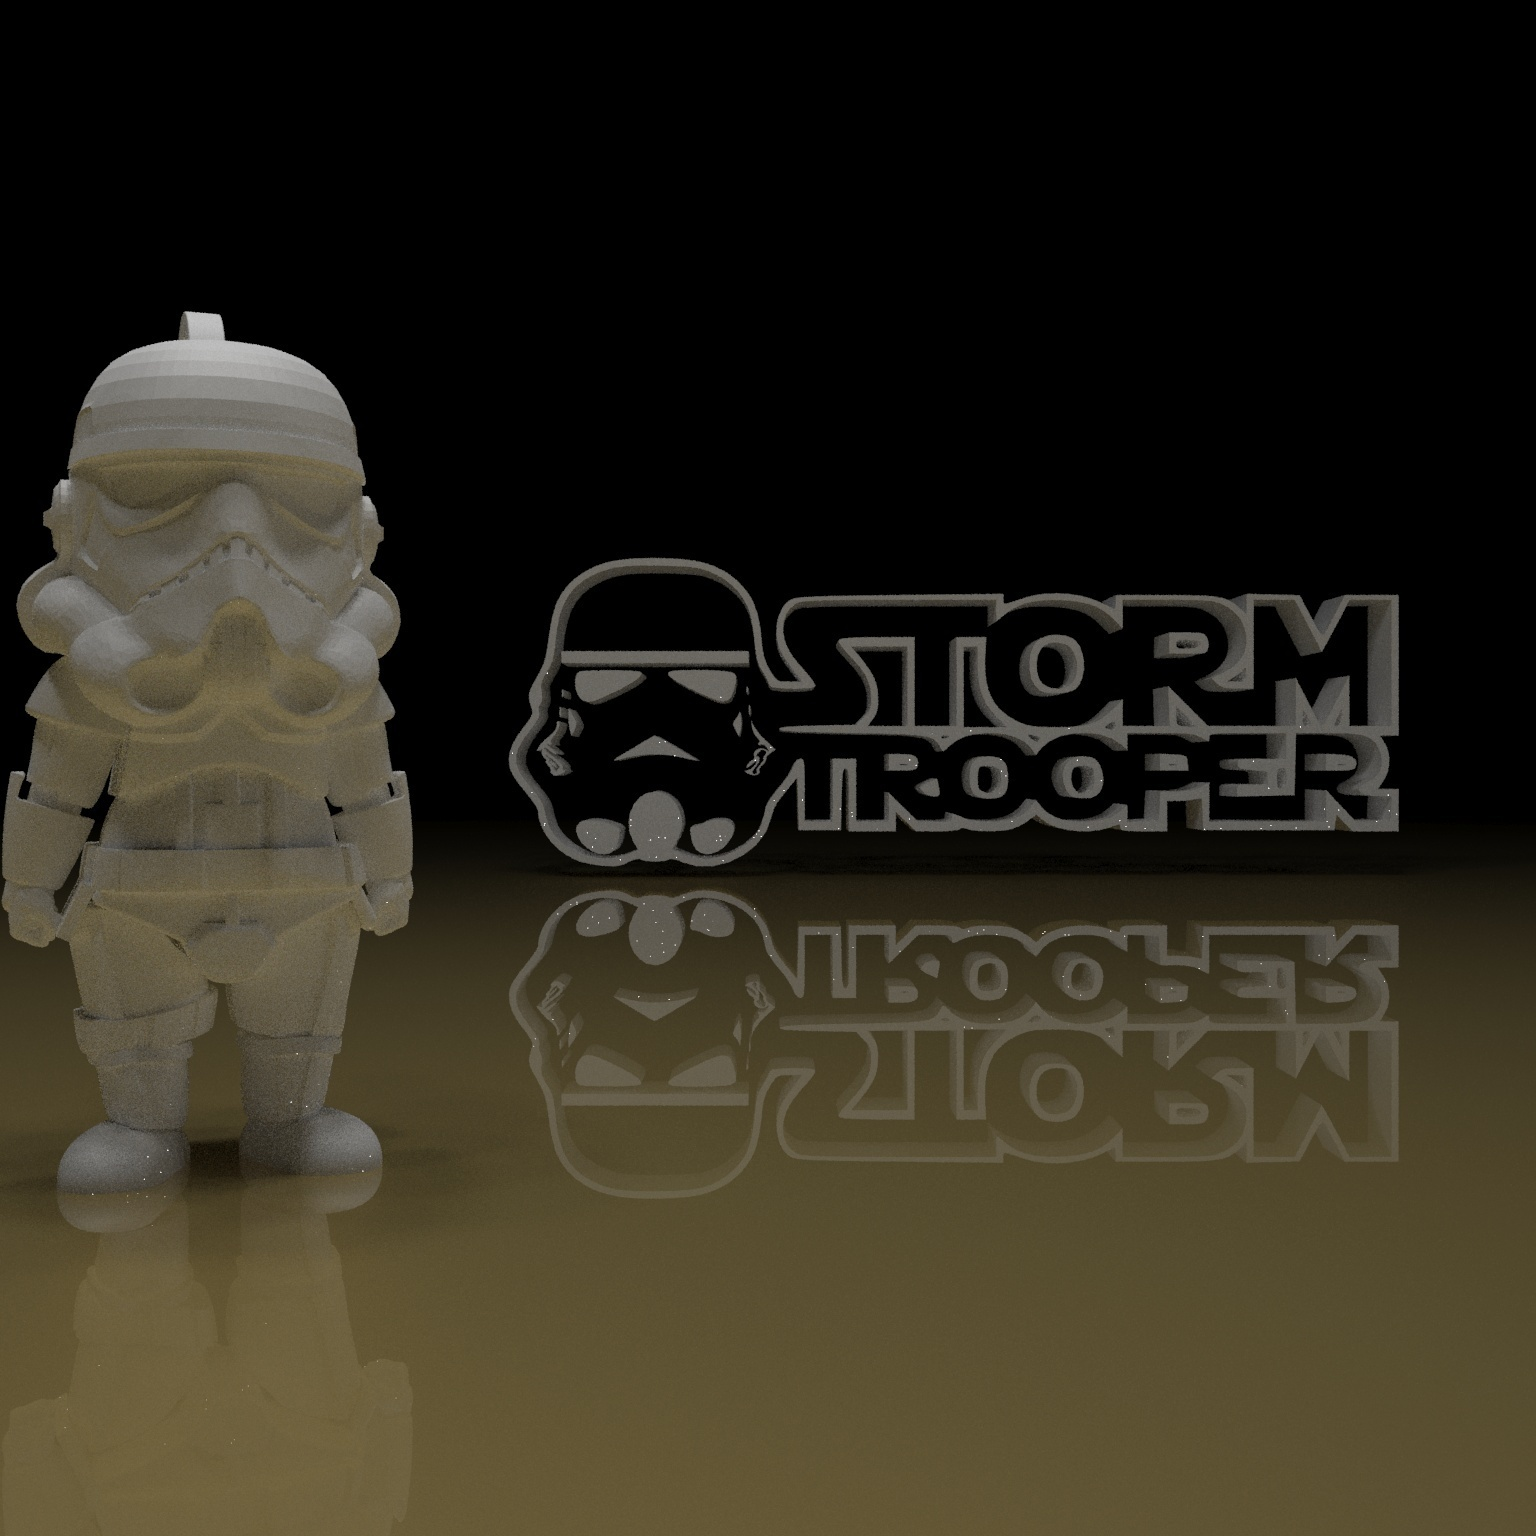 5.jpg Download free STL file STORMTROOPER KEY CHAIN • 3D printing template, paltony22